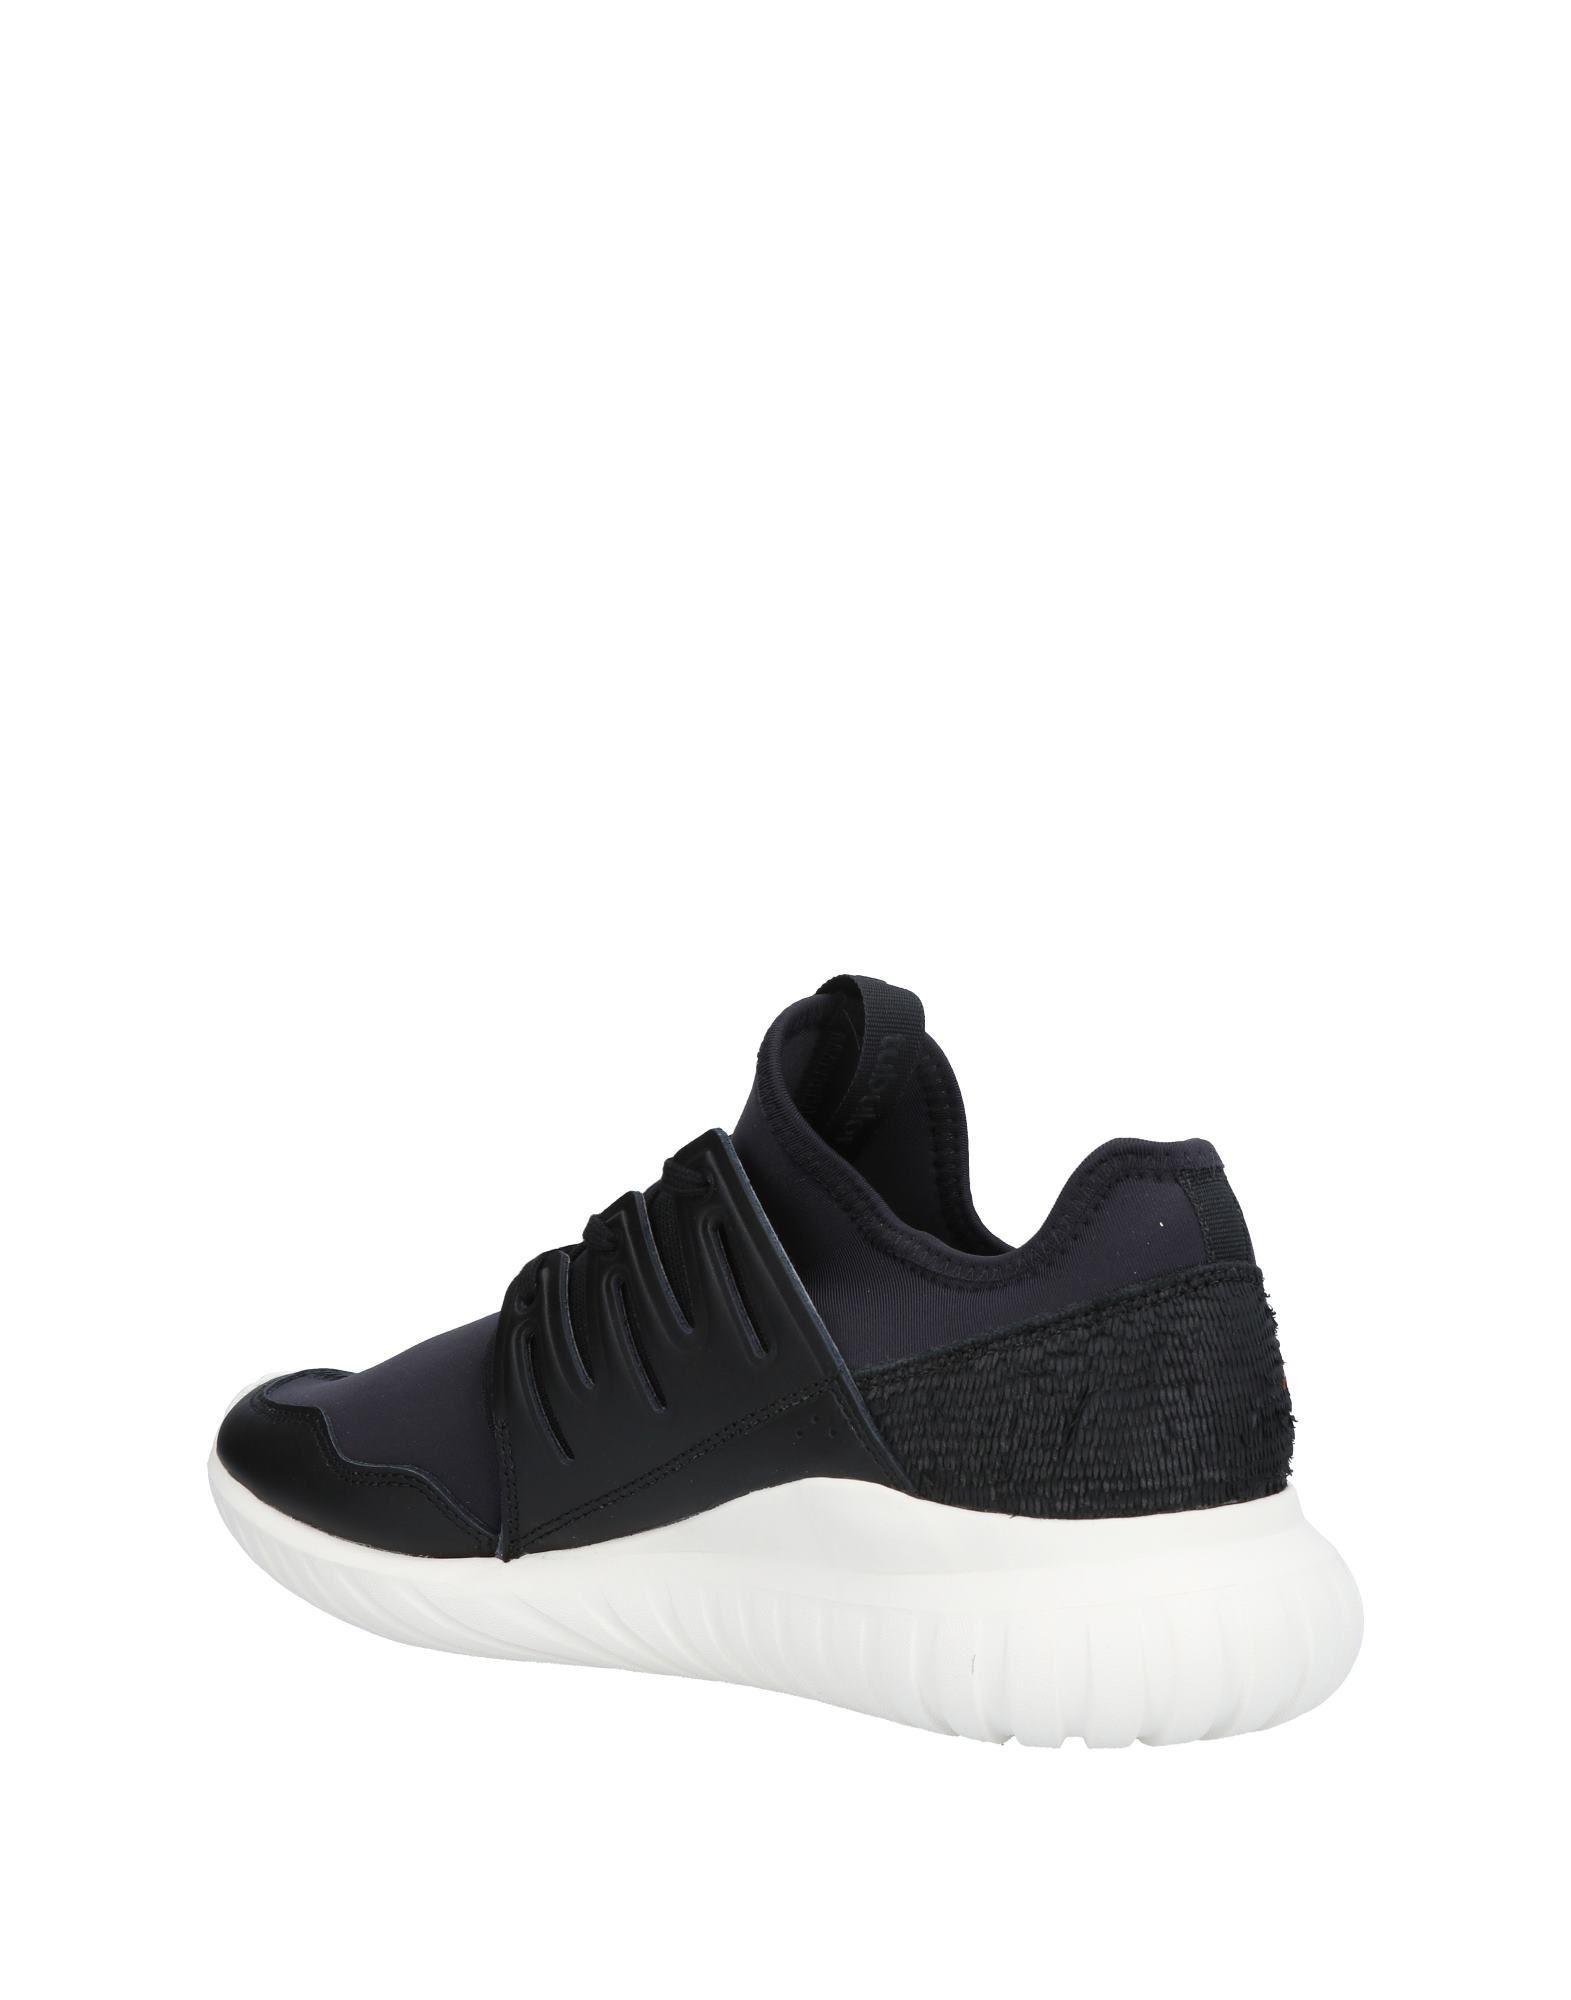 Adidas 11437040RB Originals Sneakers Herren  11437040RB Adidas adc0b2